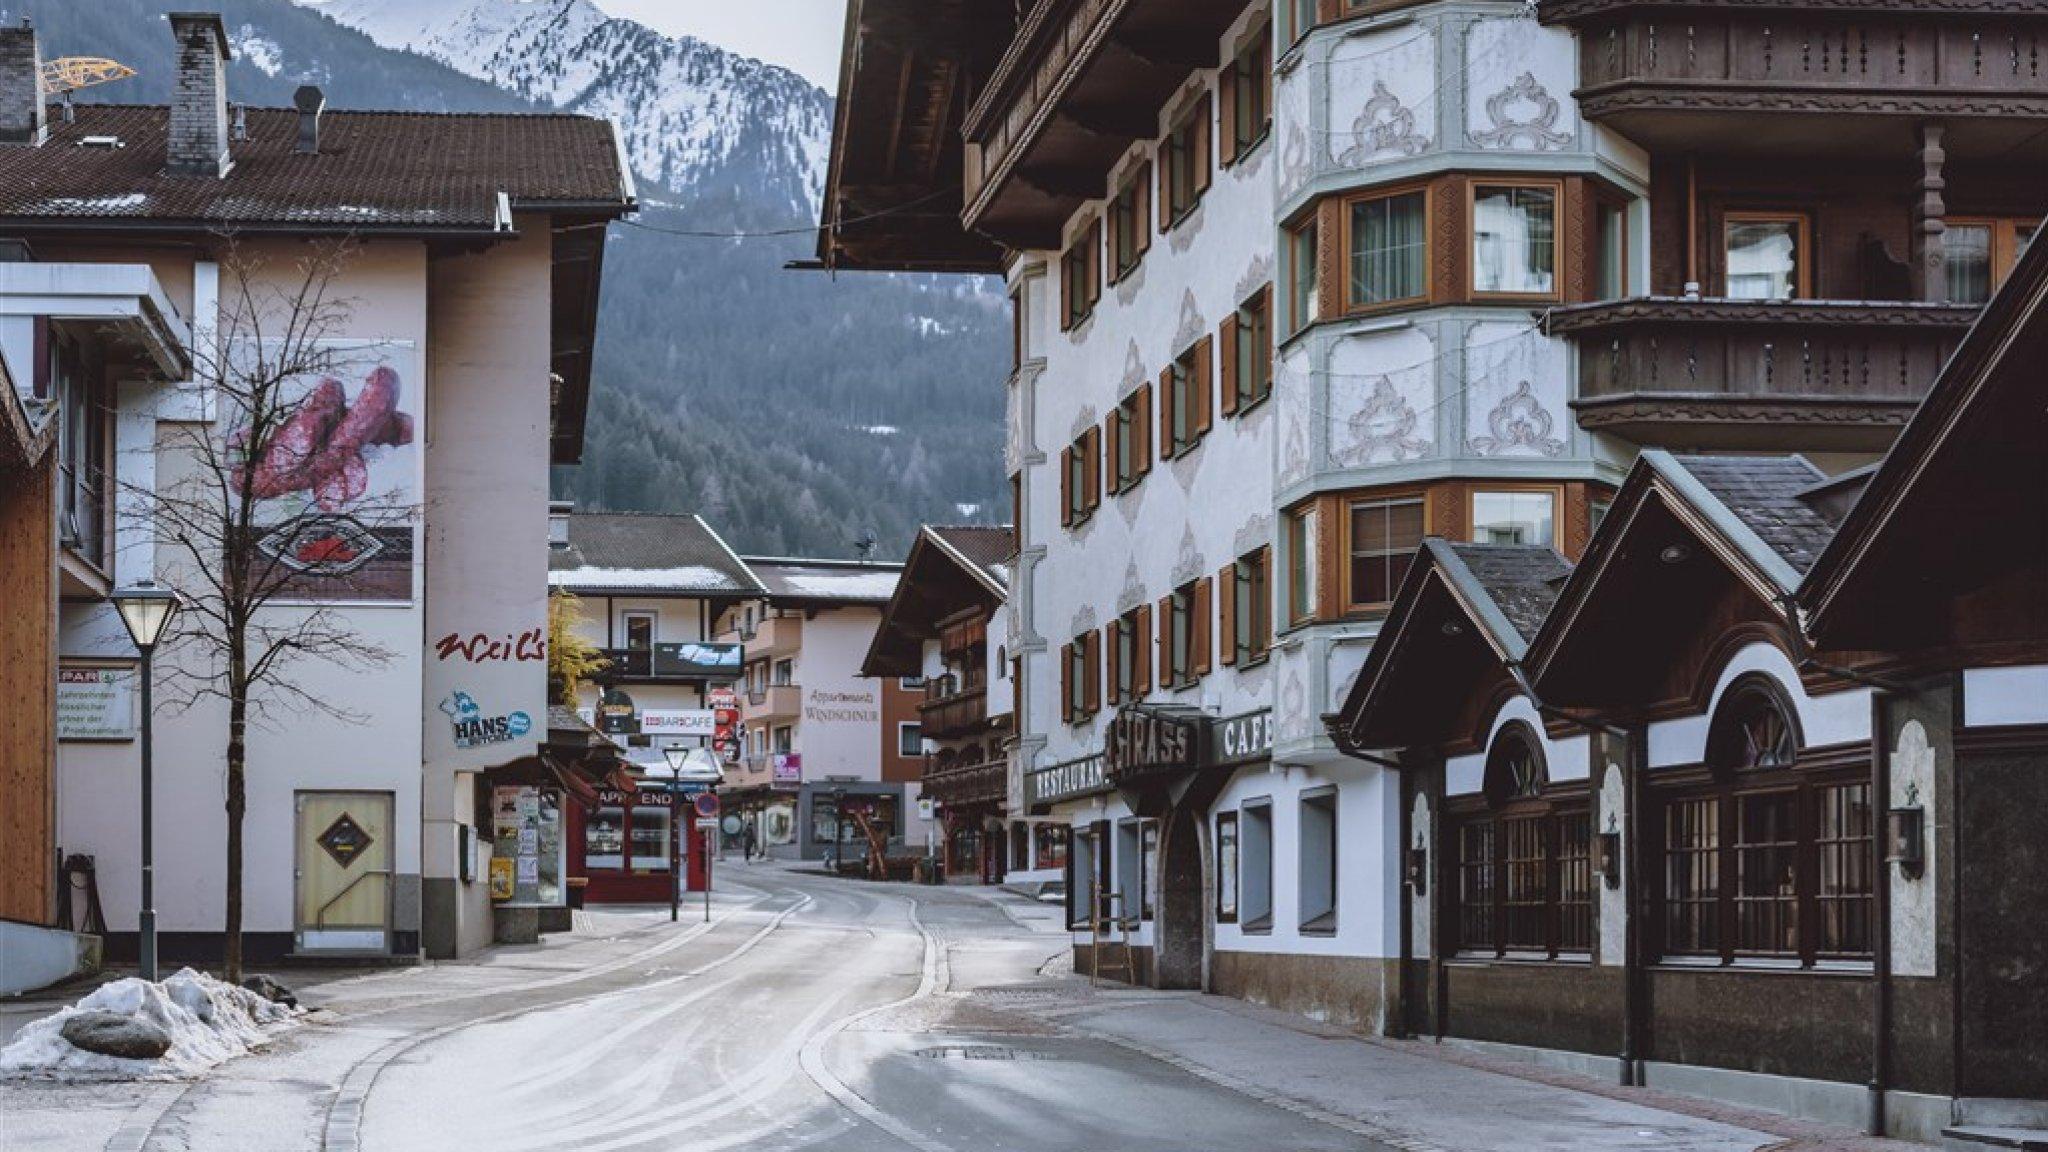 South African Alternative Breakout: Austrian Ski Village Totally Closed